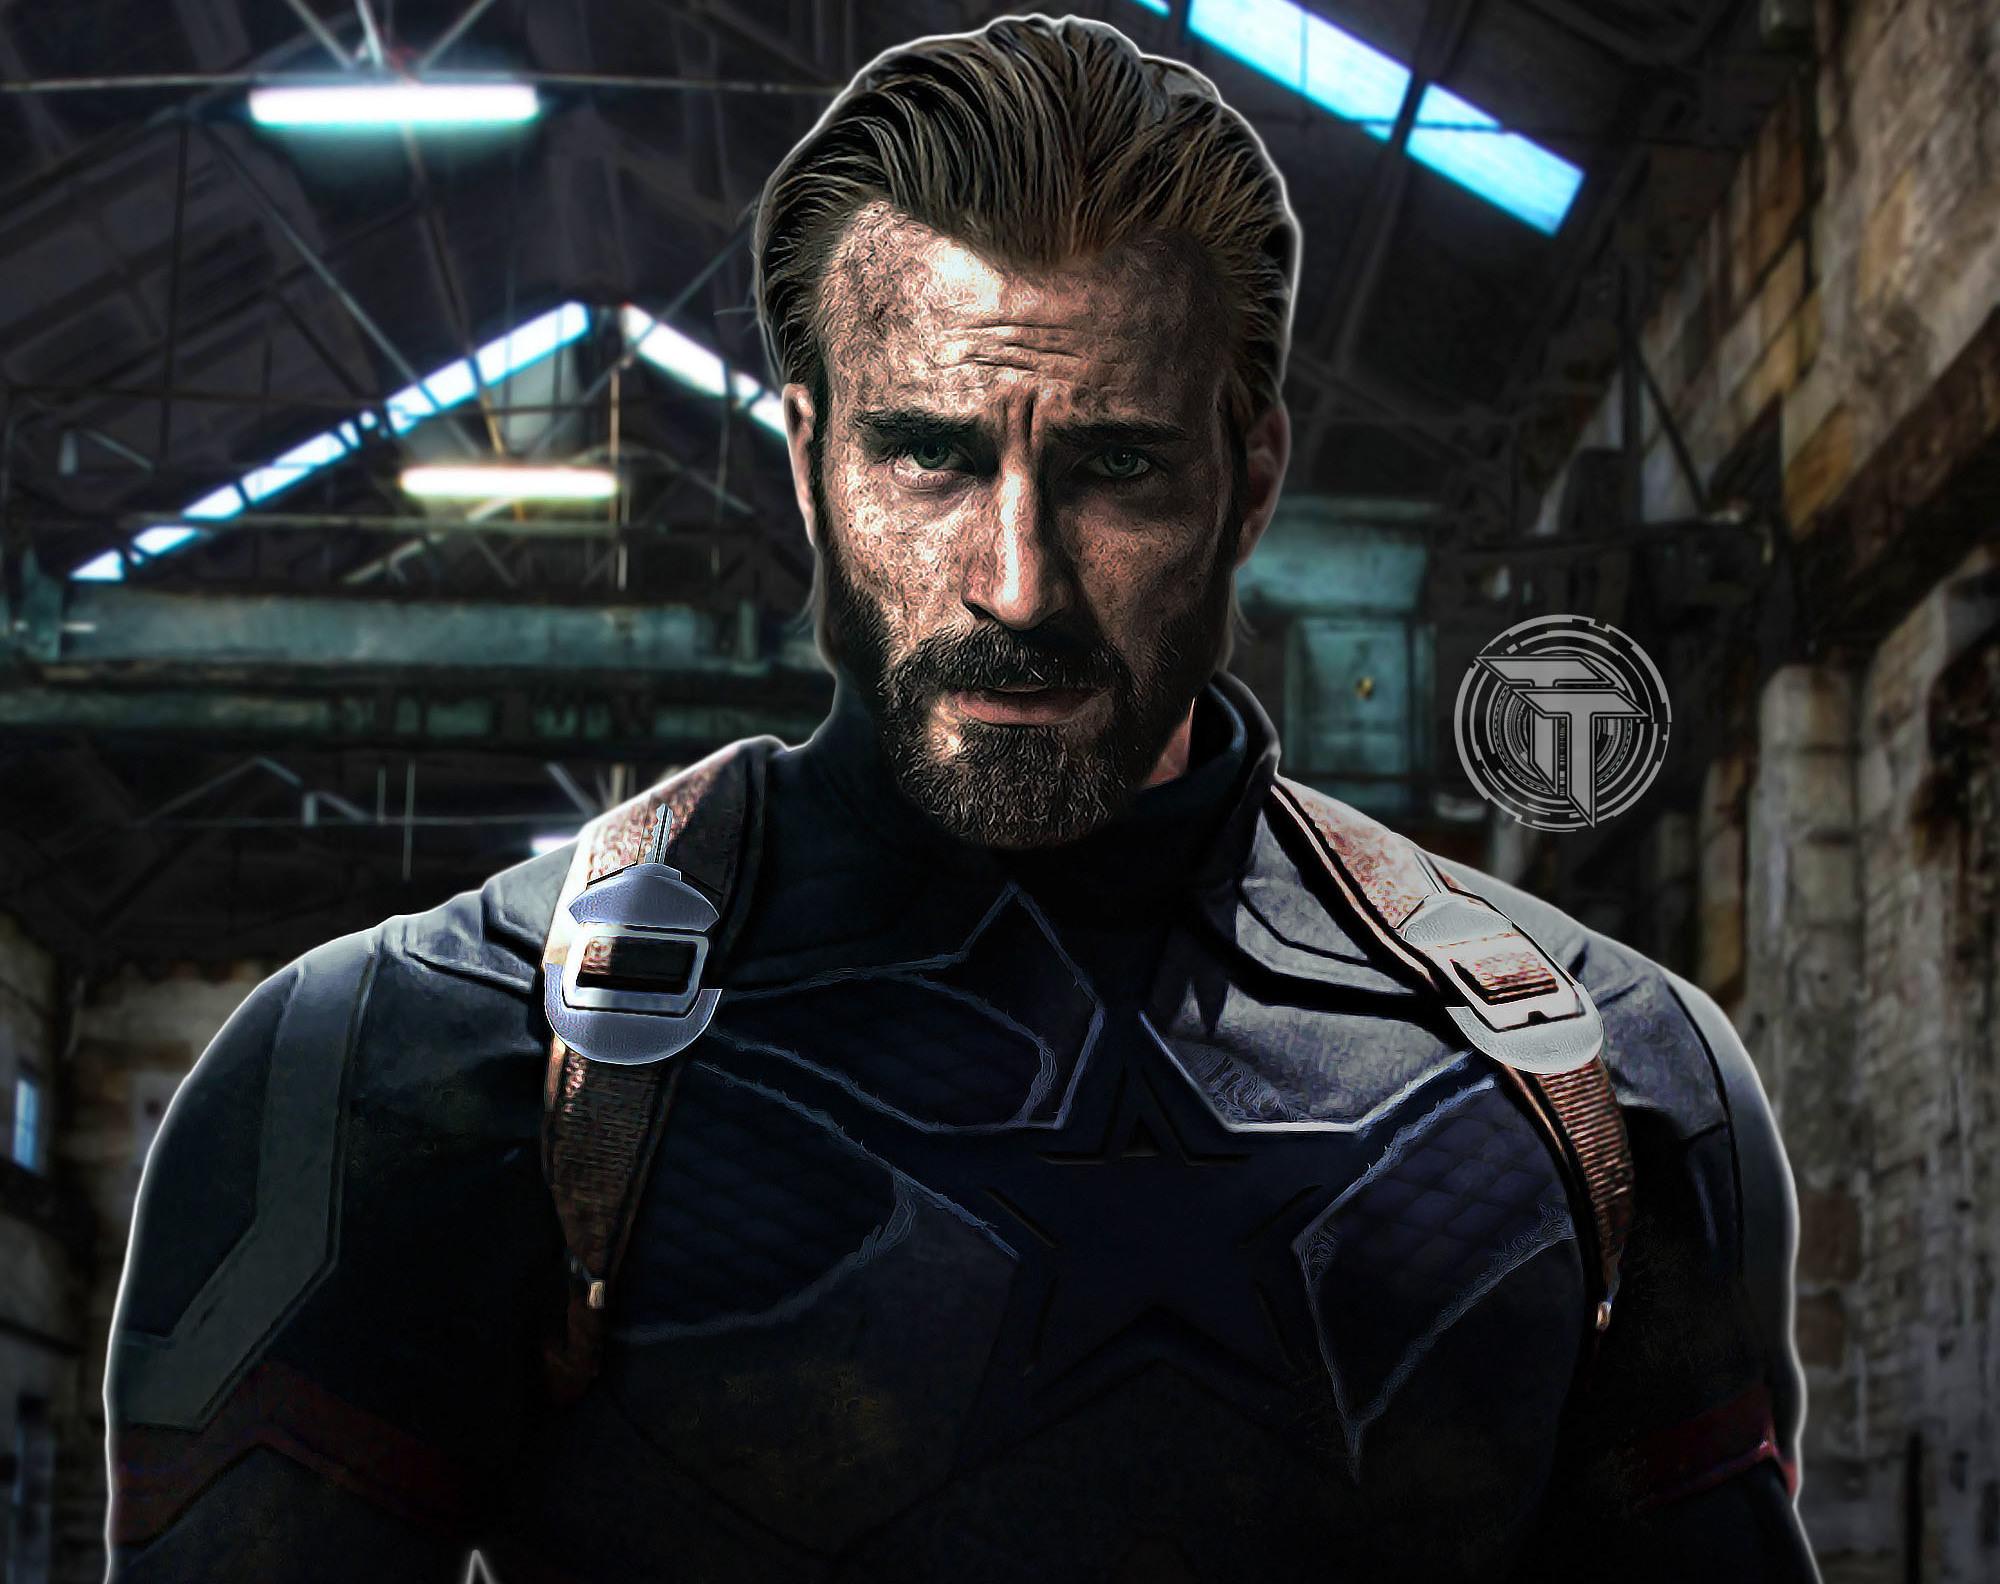 Captain America Beard Look In Infinity War Wallpaper Hd